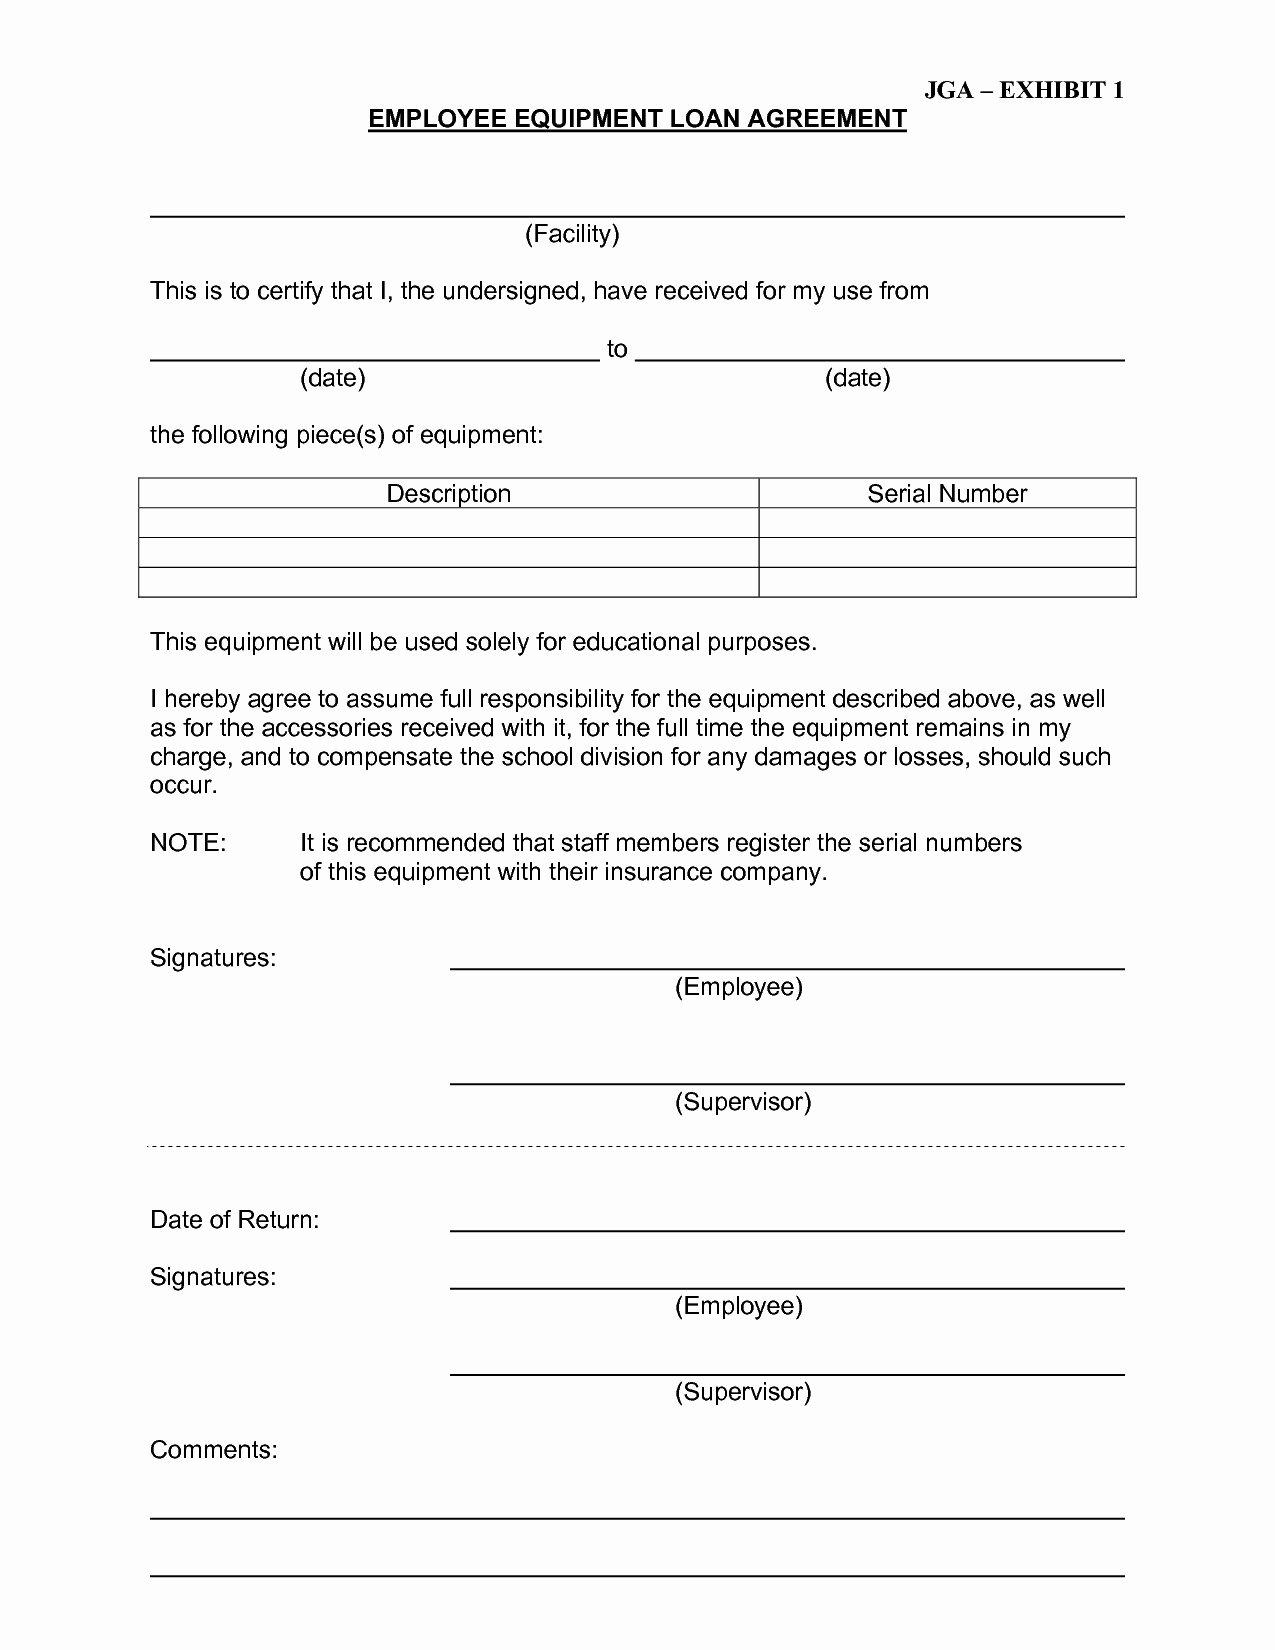 Equipment Loan Agreement Template Inspirational Equipment Loan Agreement Template Free Plete Best S